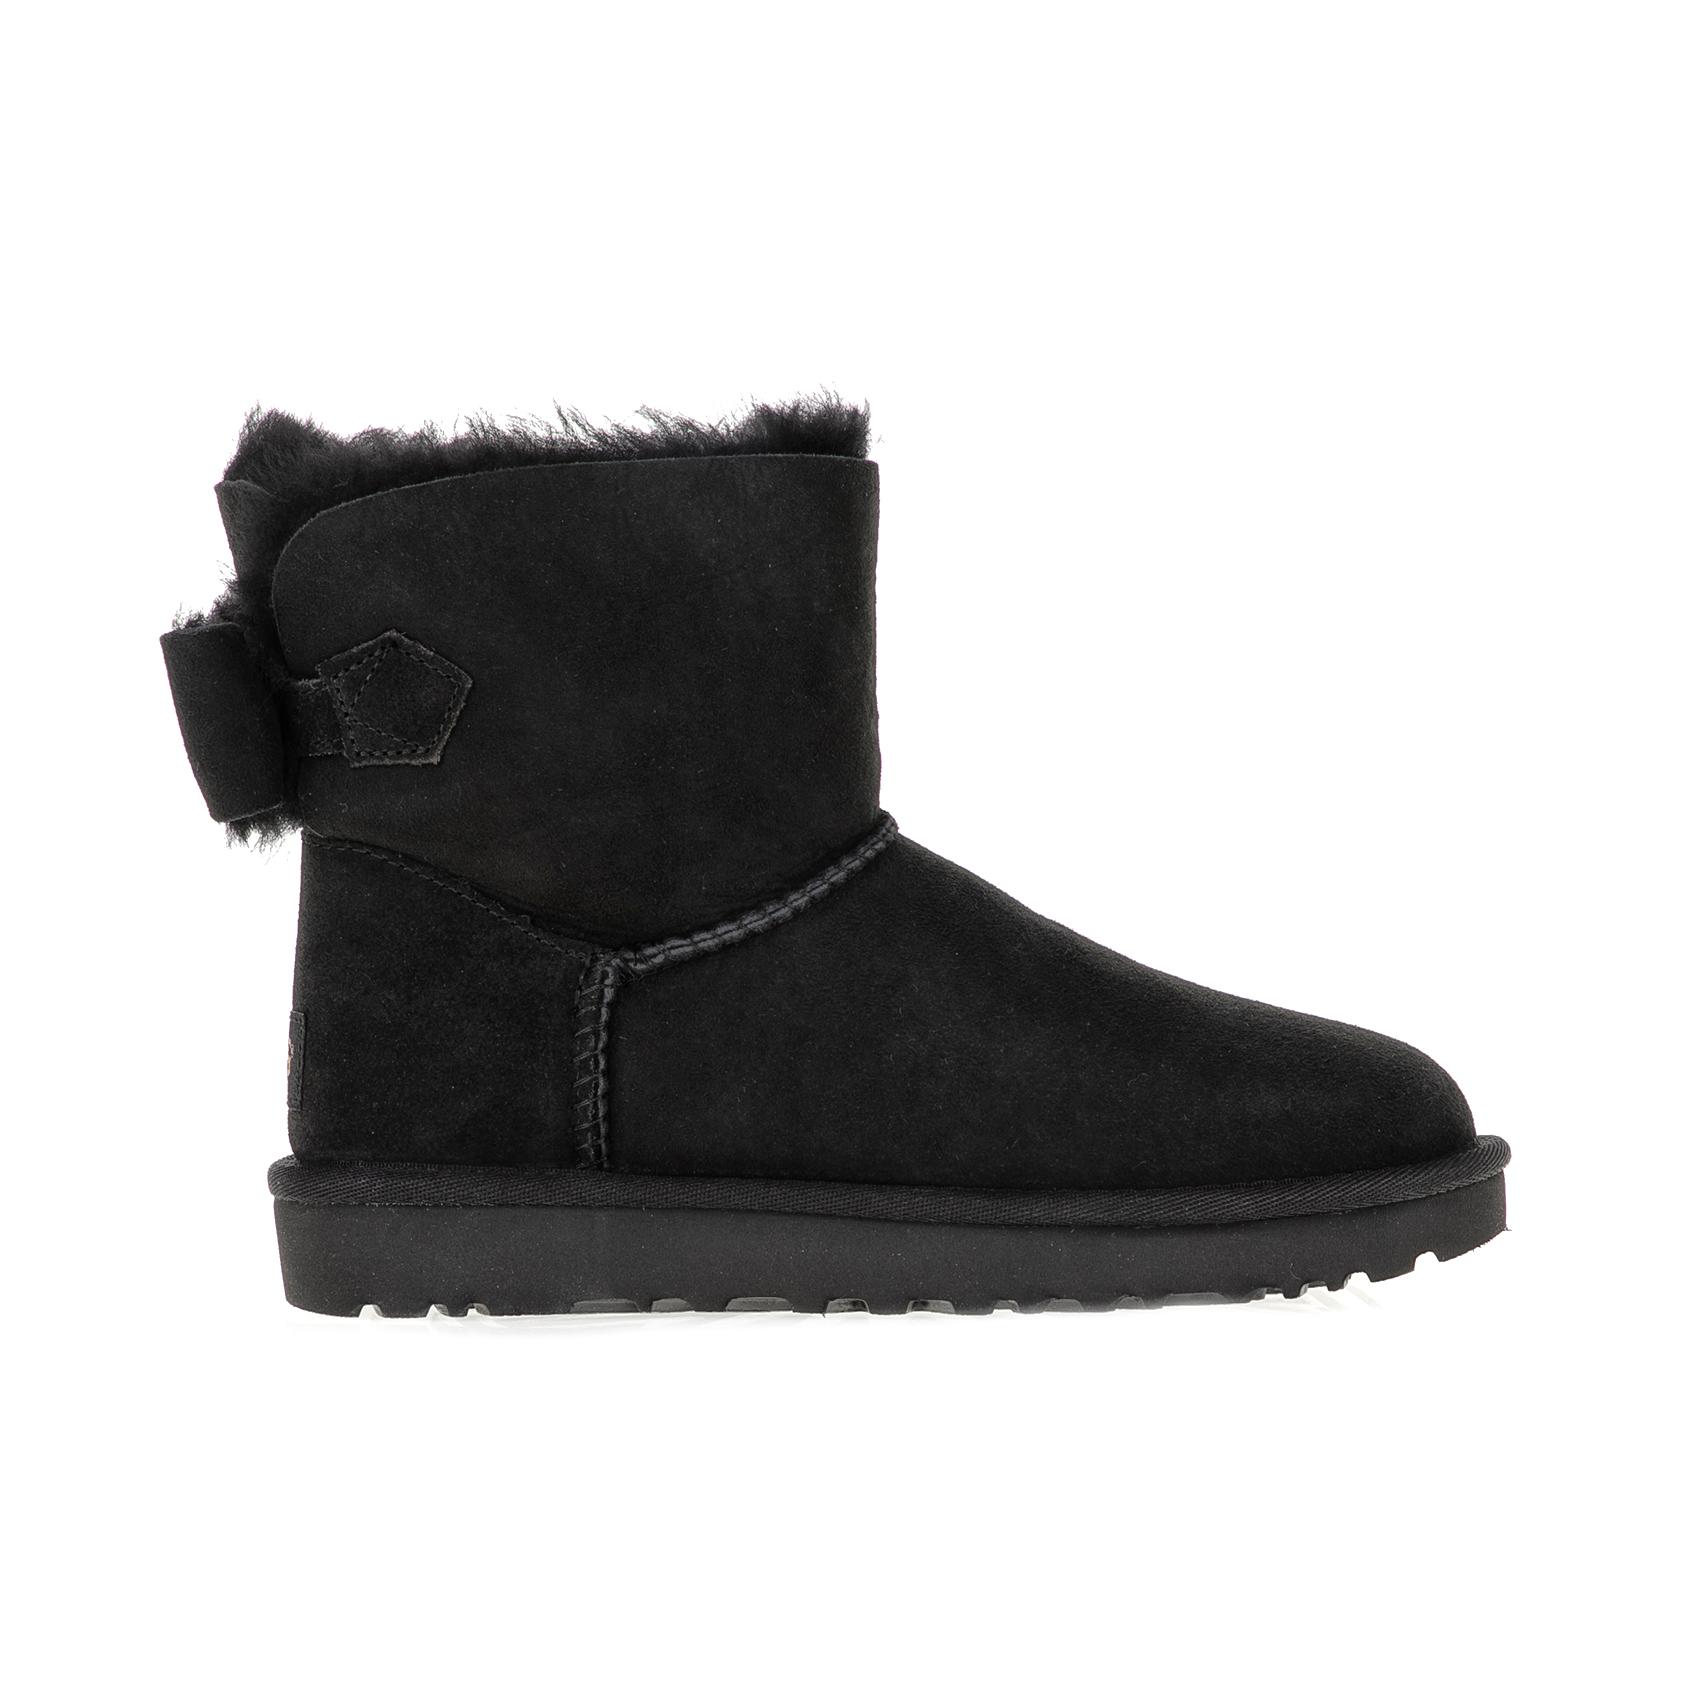 UGG - Γυναικεία μποτάκια NAVEAH UGG AUSTRALIA μαύρα γυναικεία παπούτσια μπότες μποτάκια μποτάκια